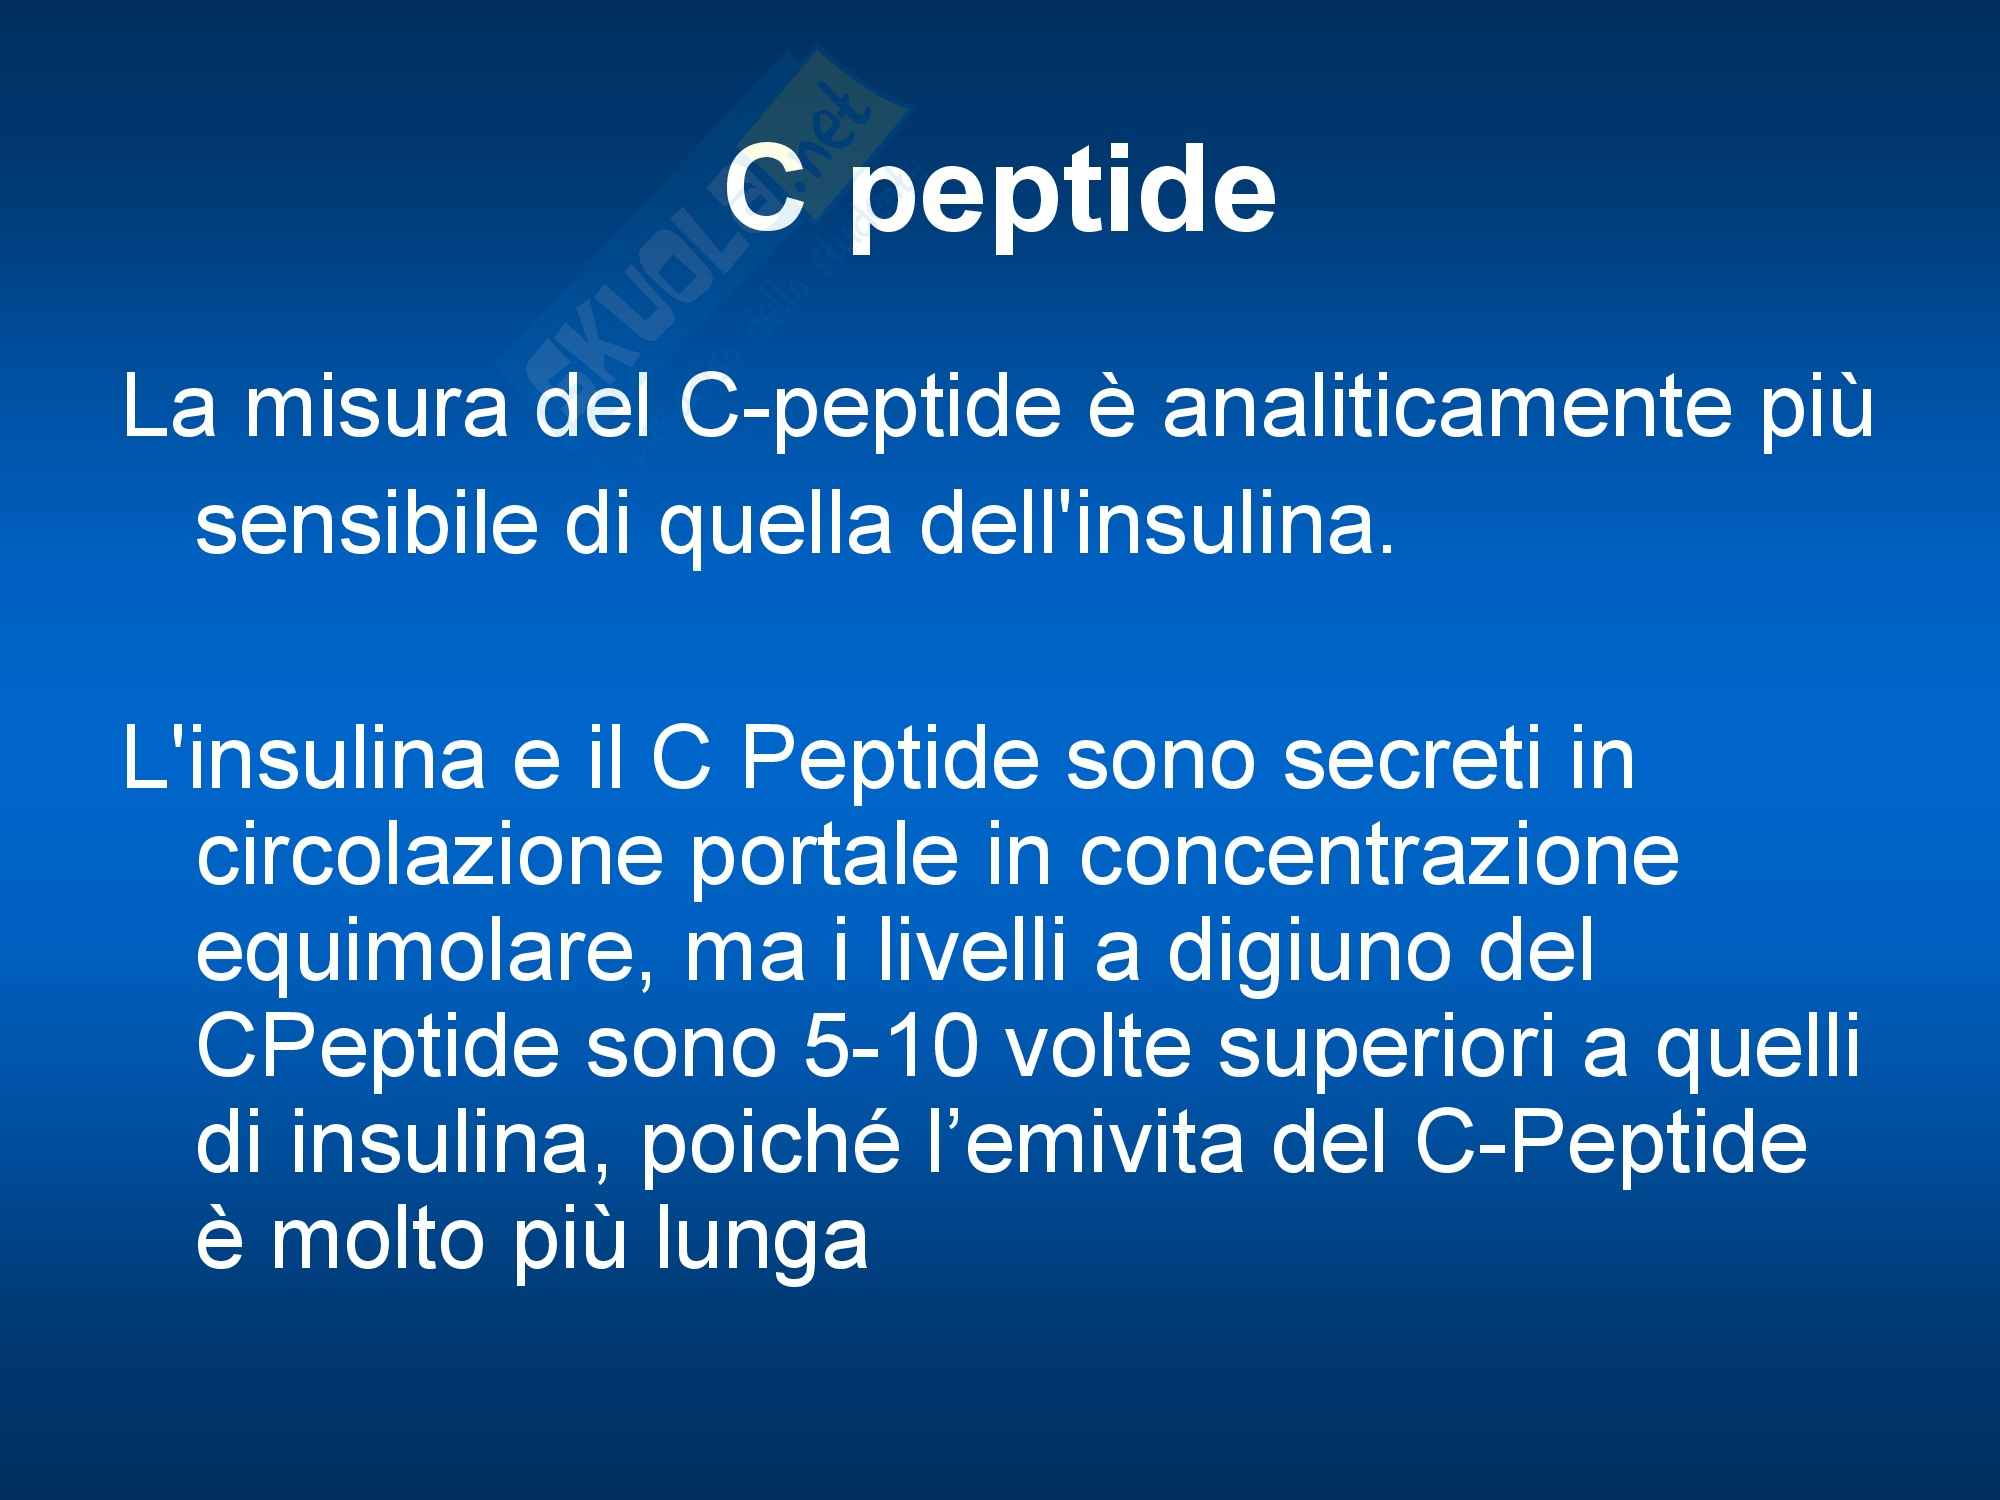 Endocrinologia - Diabete Pag. 6